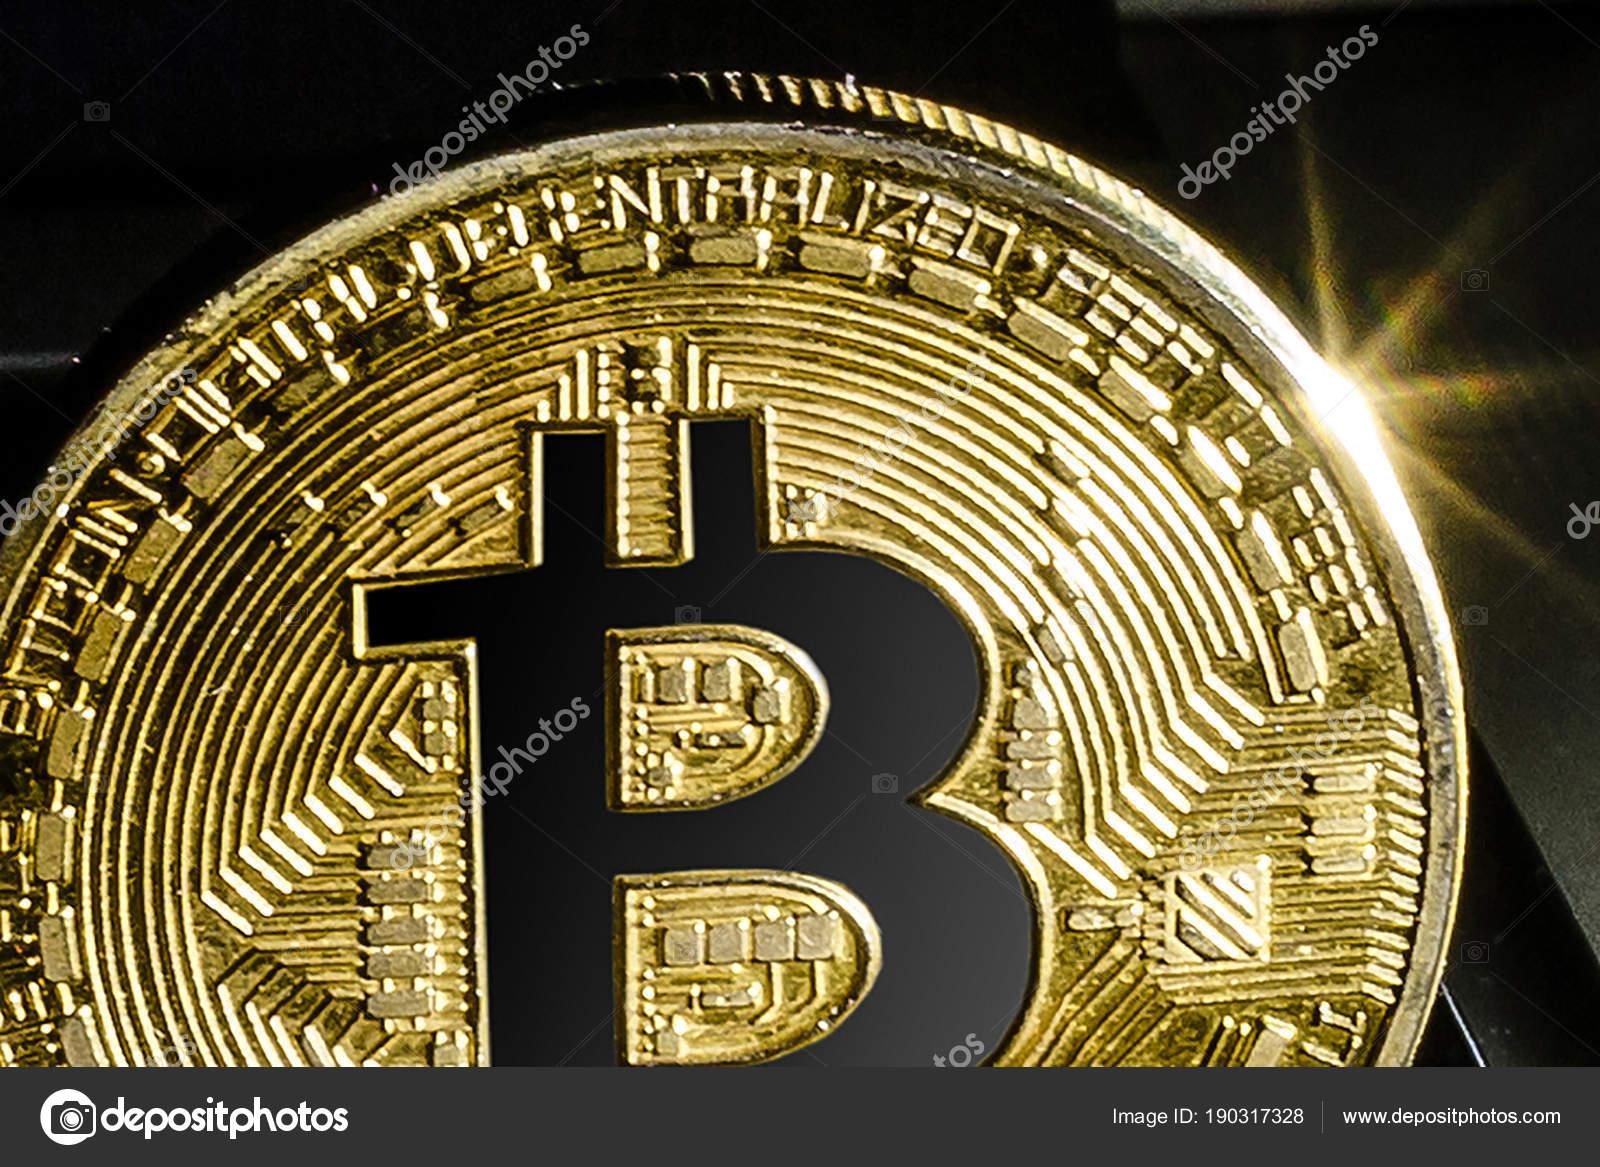 Nappyclub купить bitcoin продать bitcoin